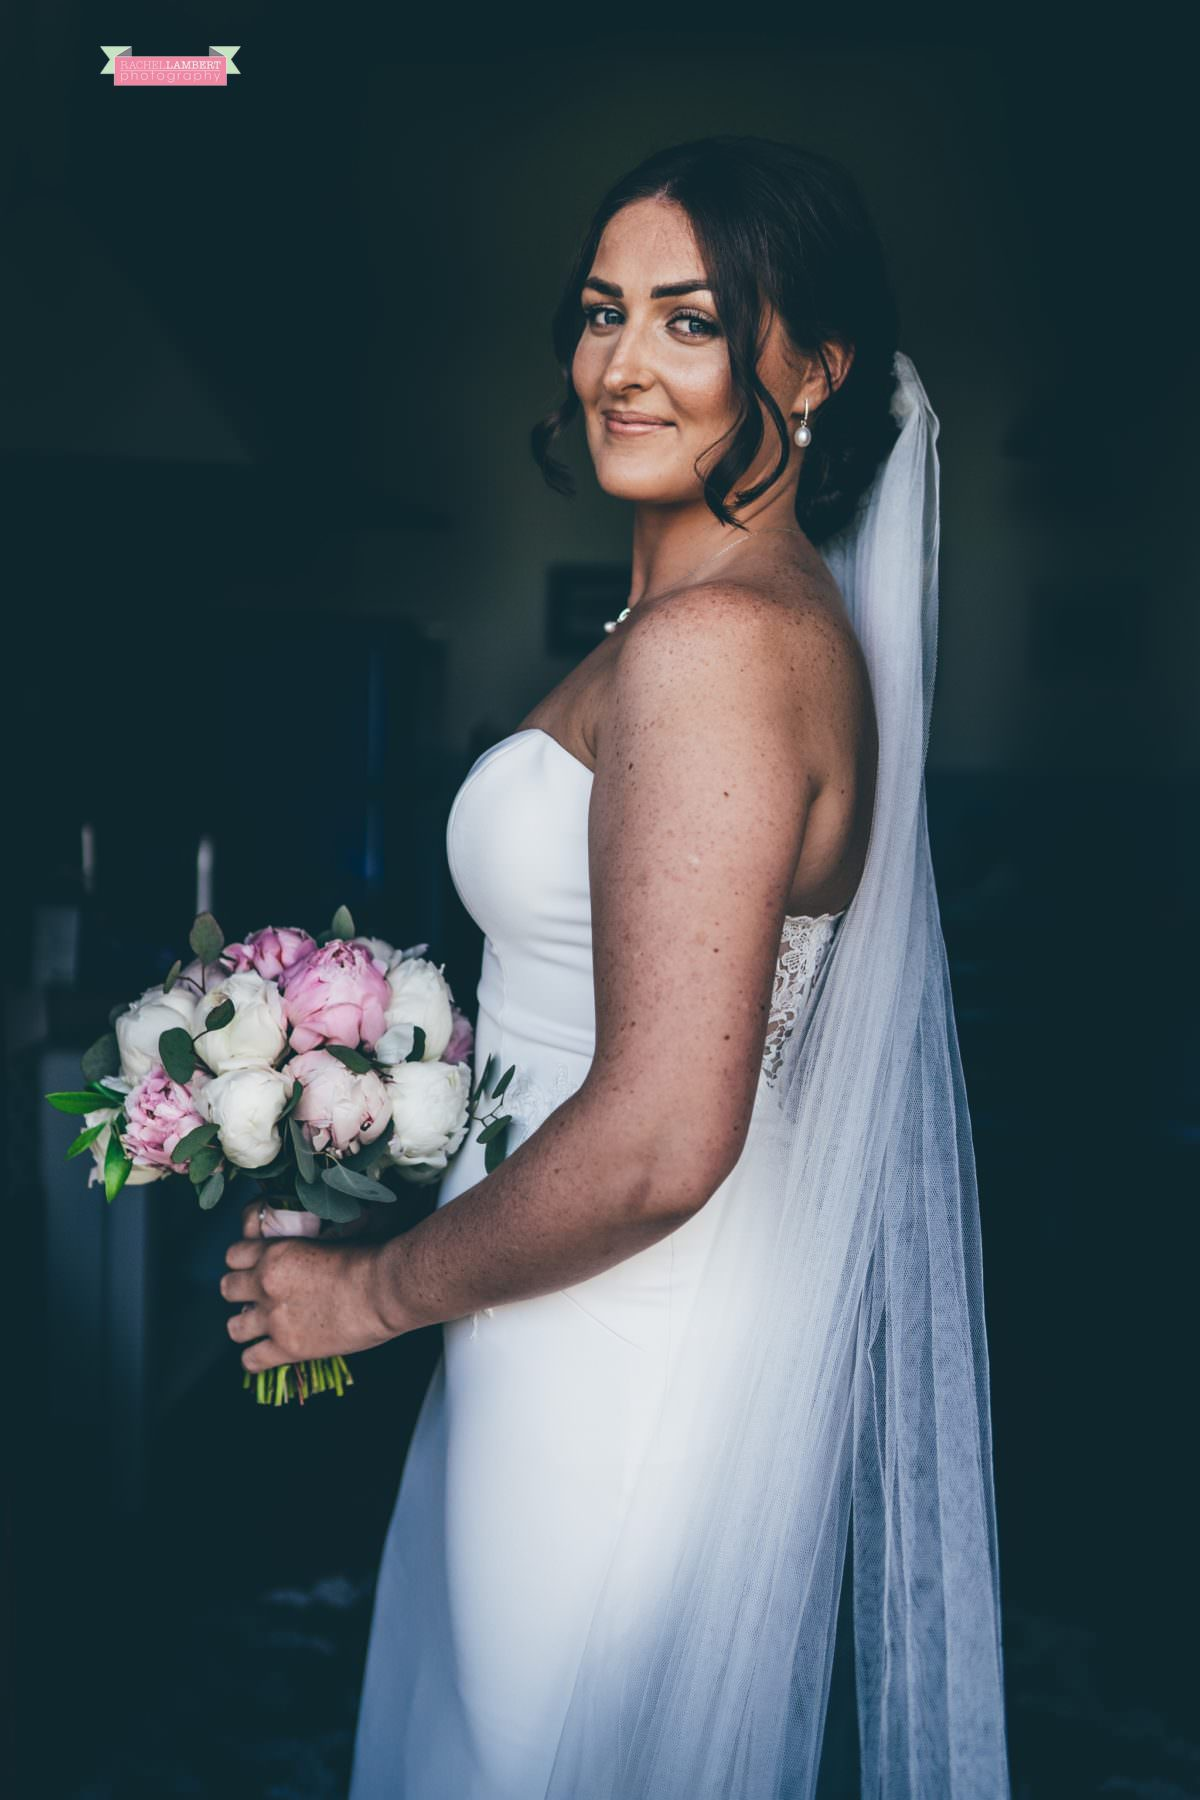 rachel lambert photography destination wedding photographer Borgo di Tragliata rome italy bridal portraits